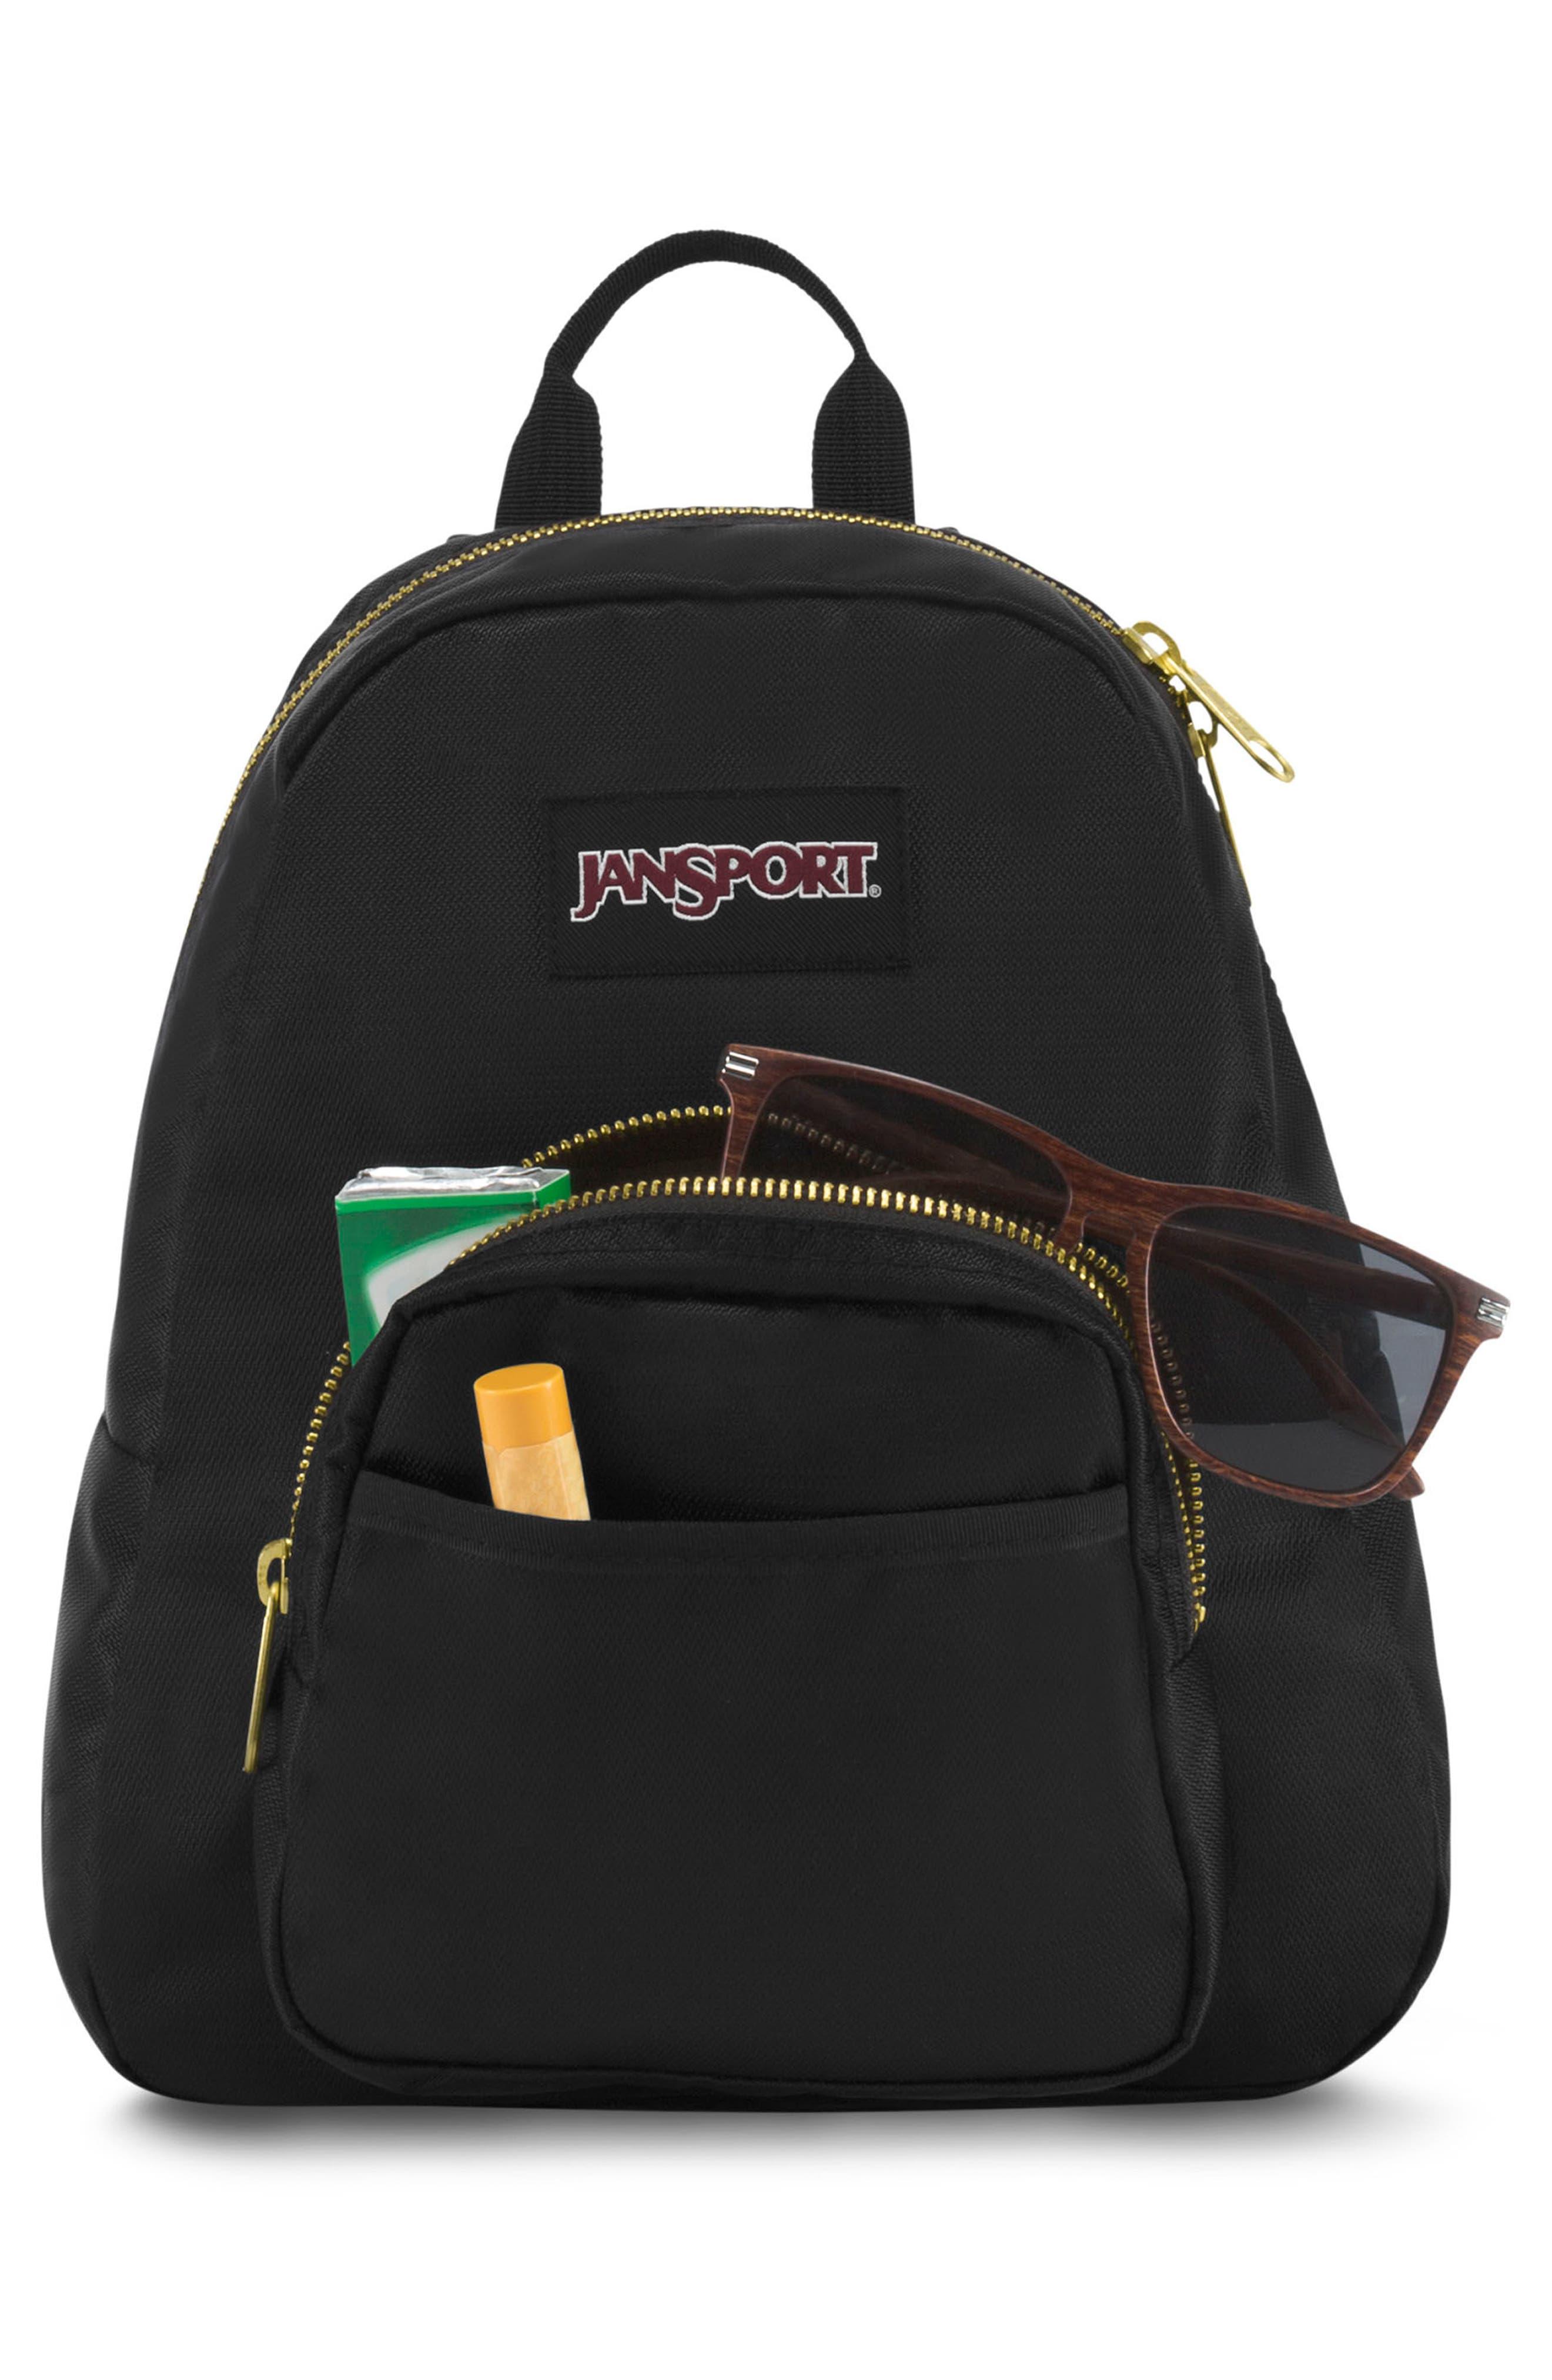 Half Pint FX Backpack,                             Alternate thumbnail 6, color,                             BLACK GOLD